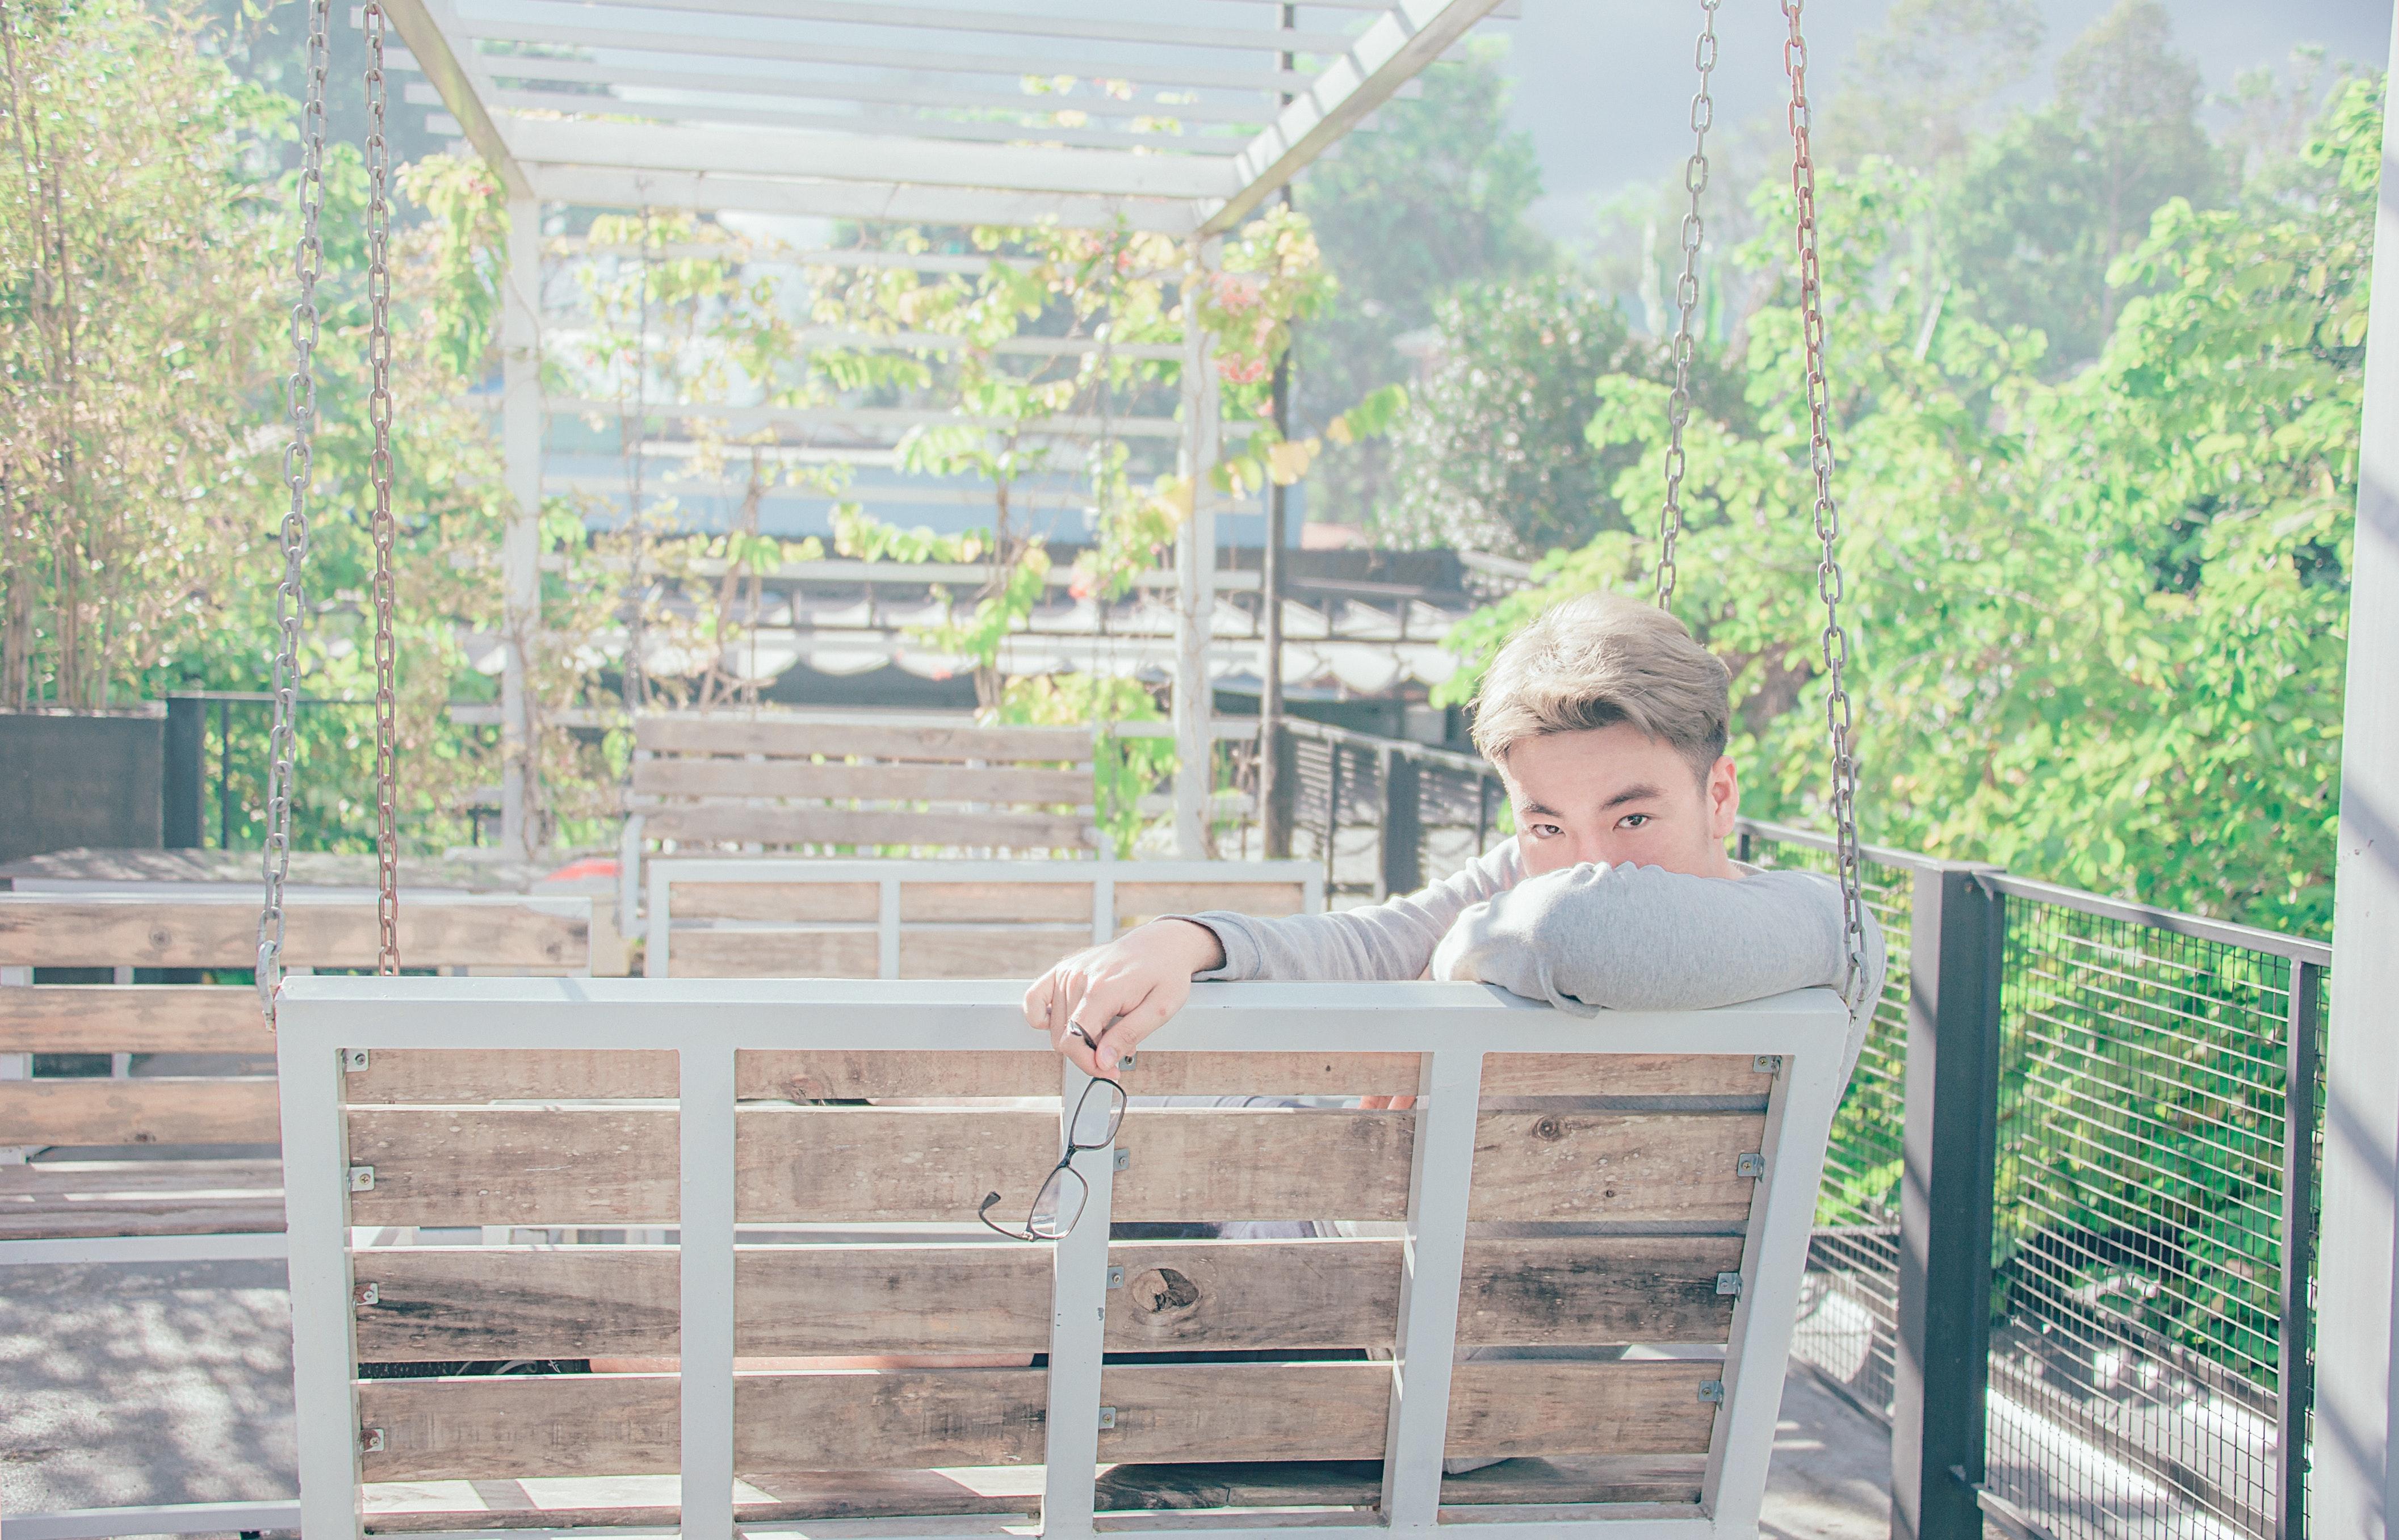 Man in gray shirt sitting on bench photo